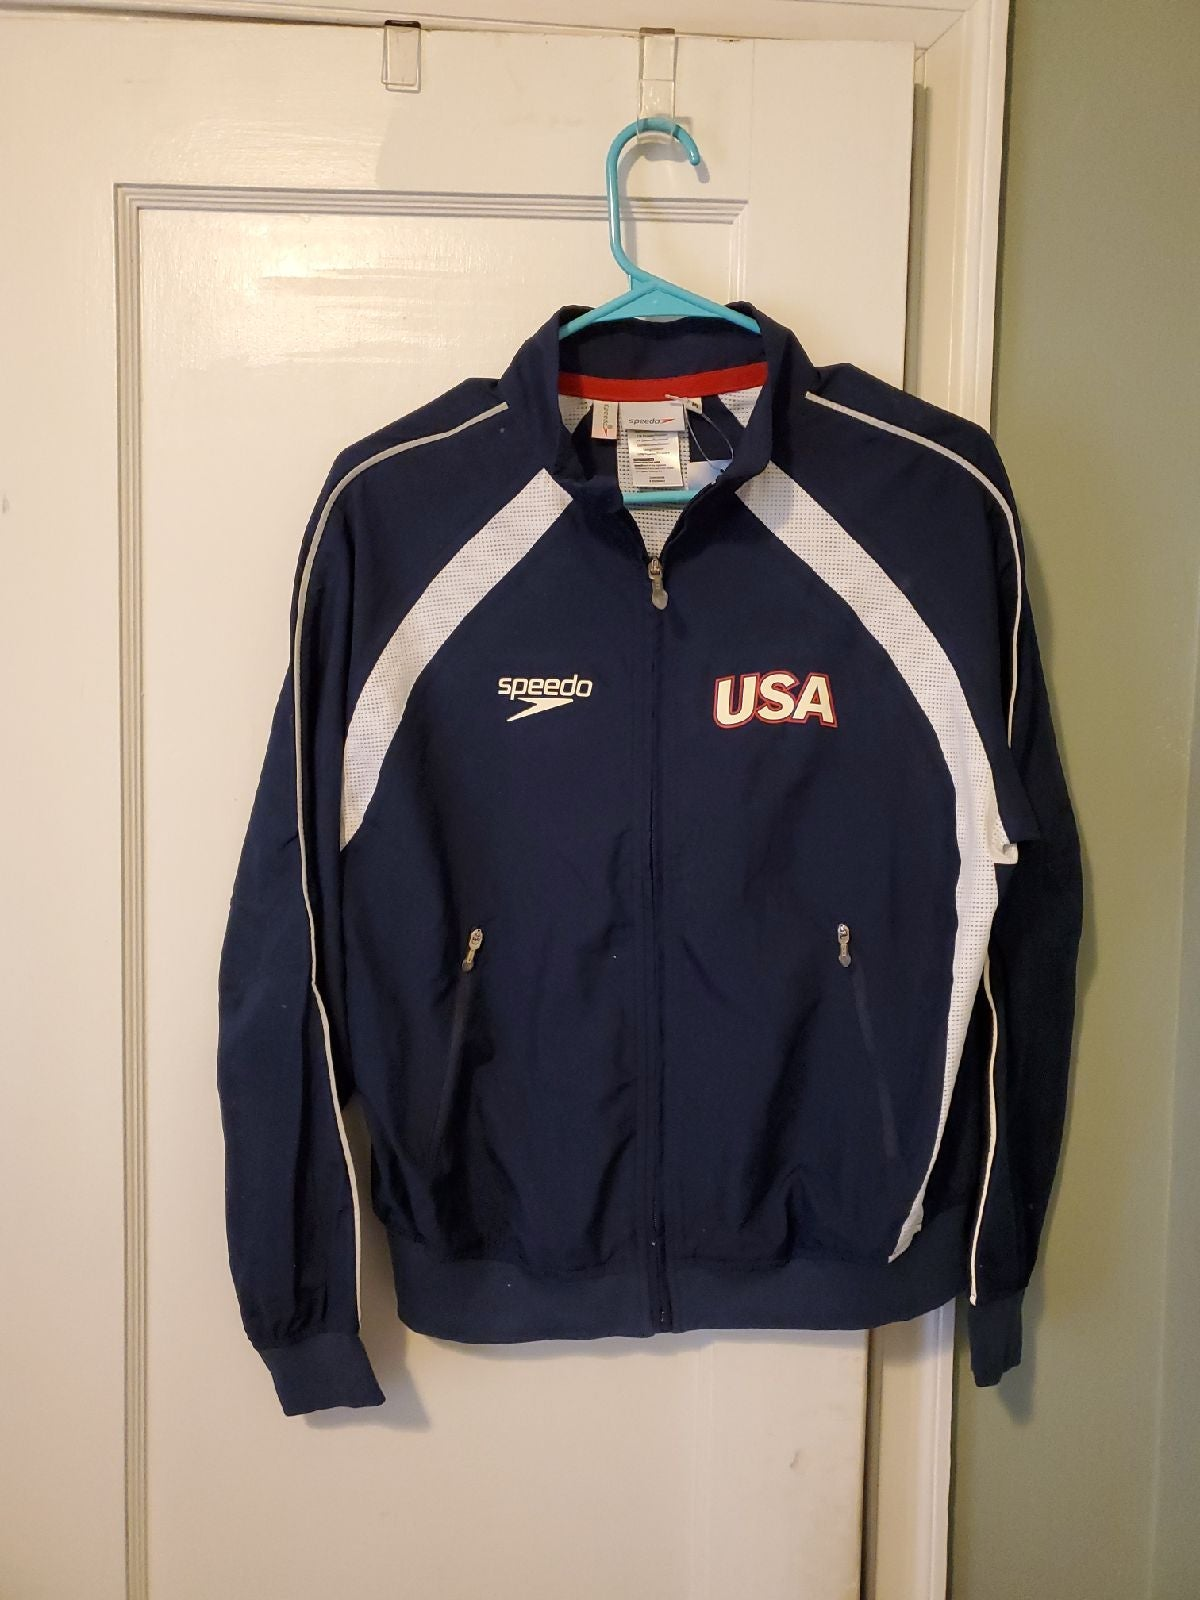 Speedo Warm-up Jacket